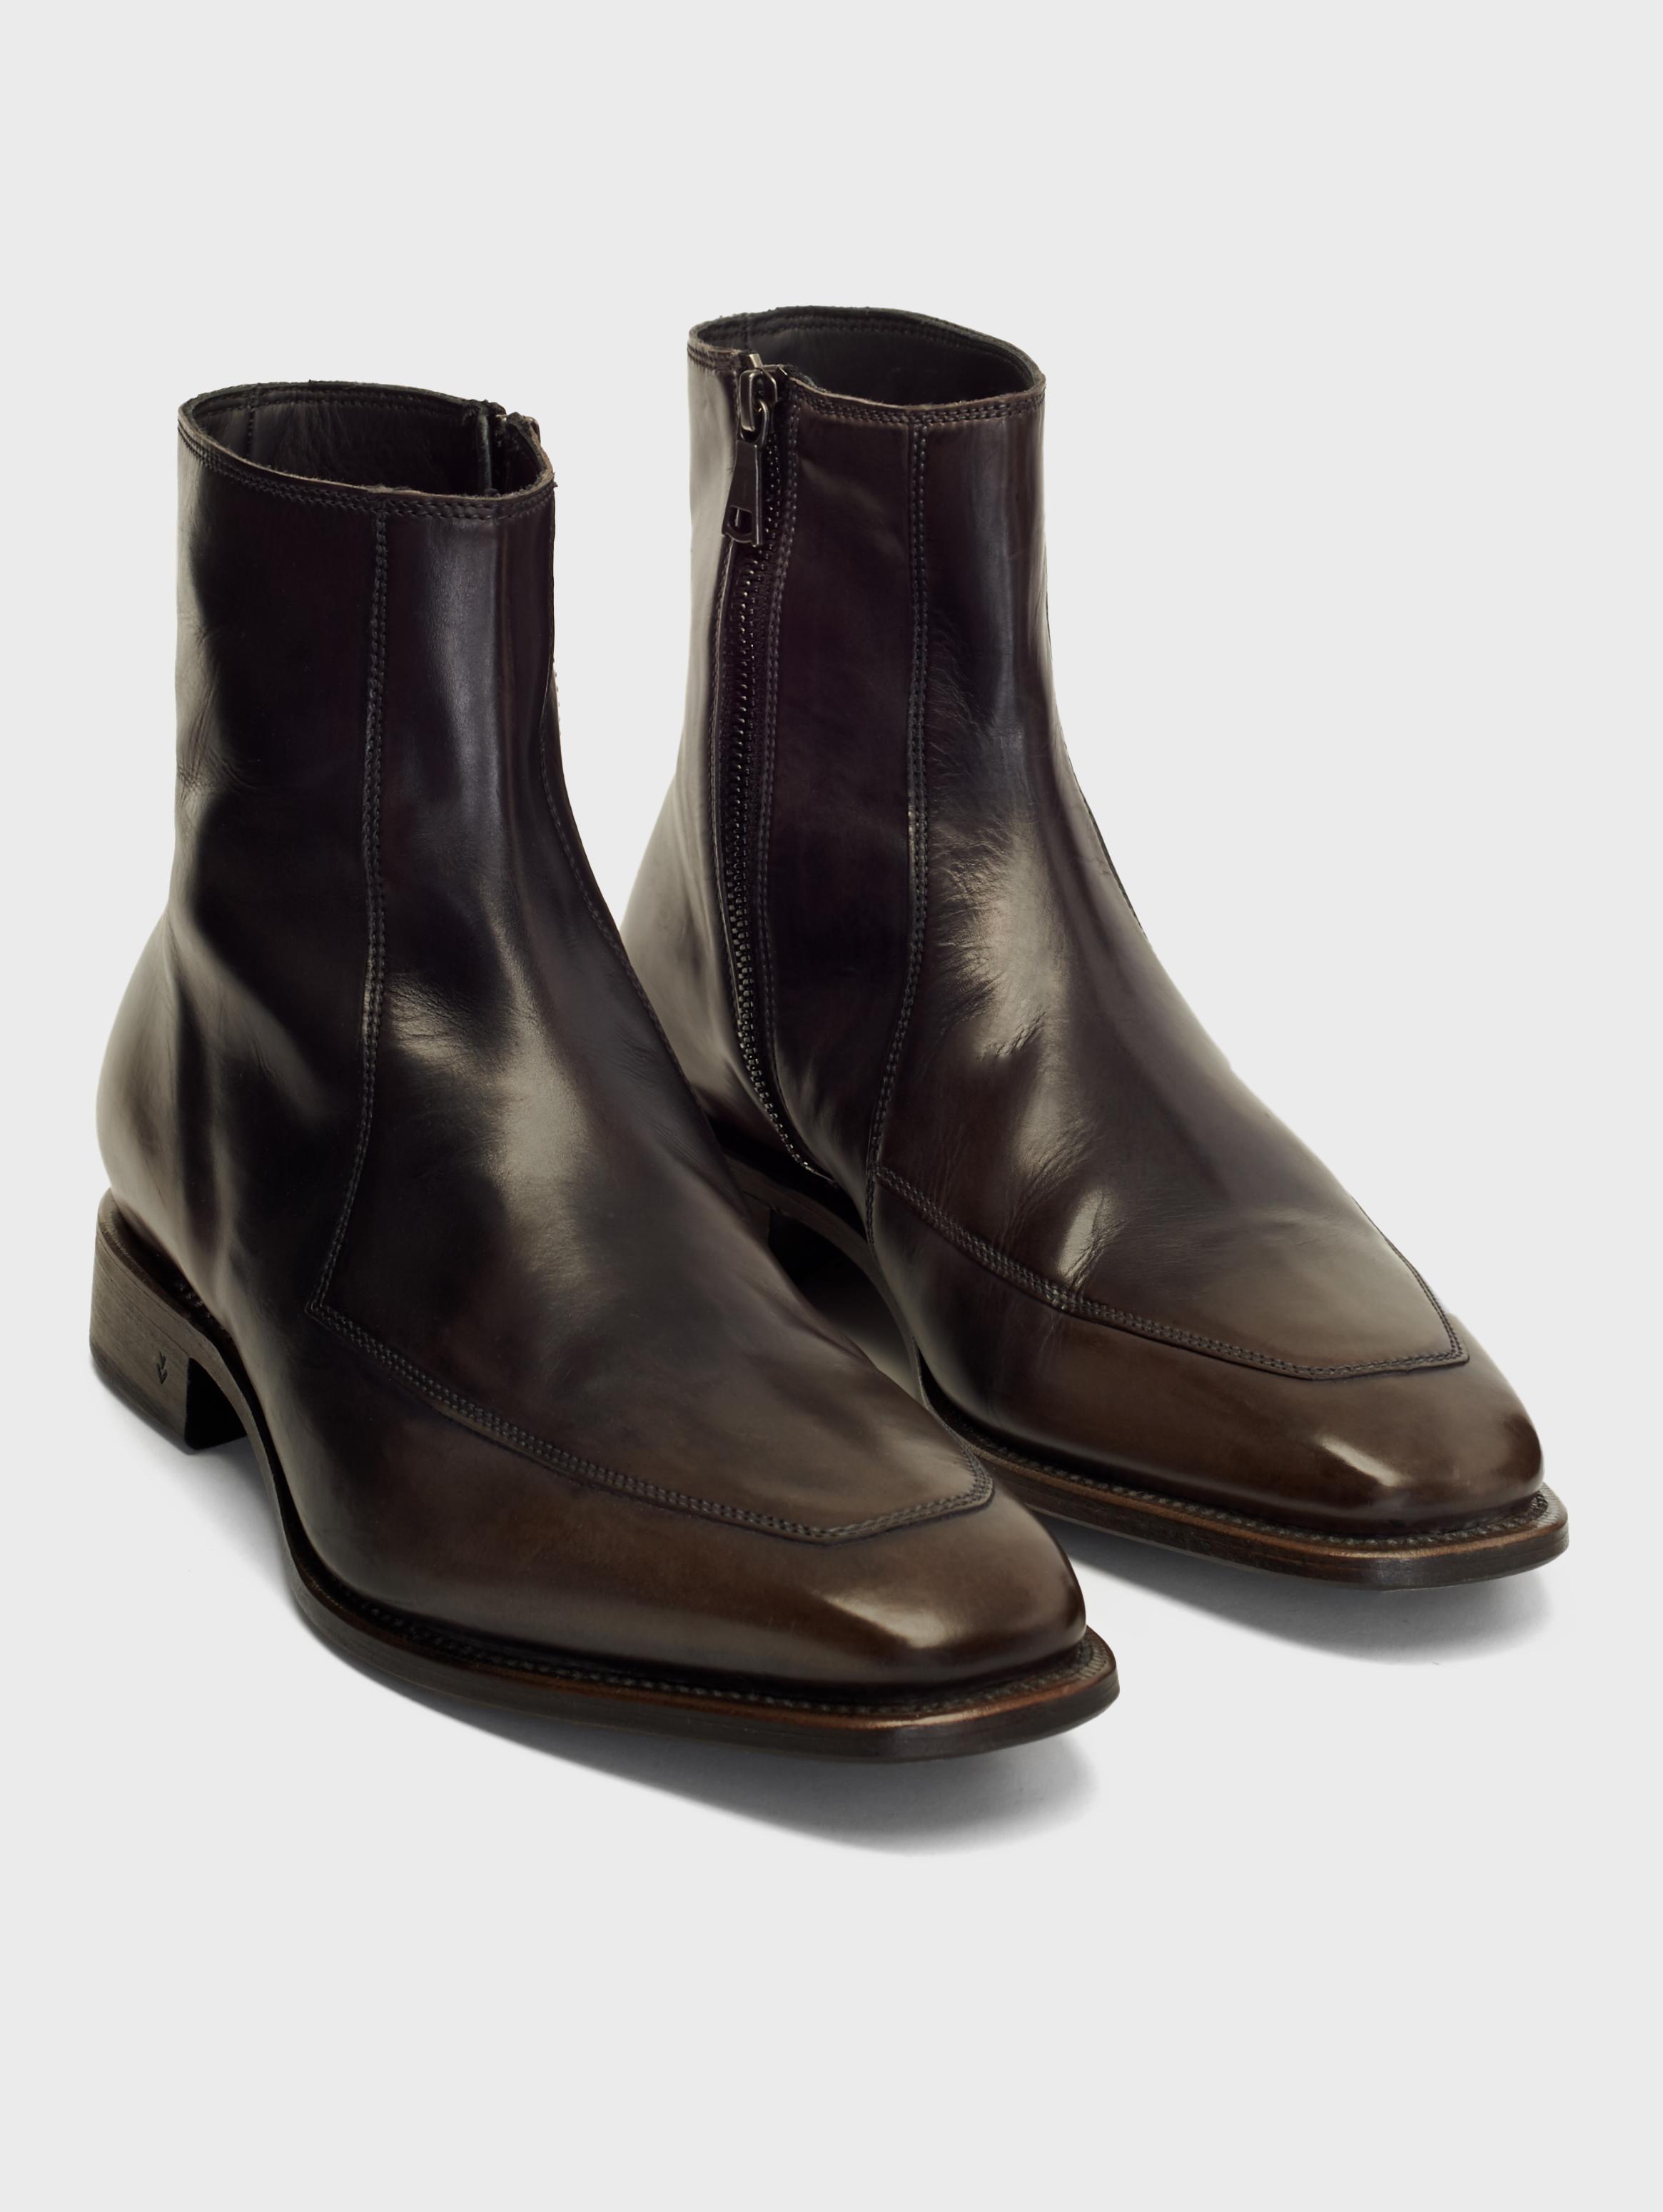 John Varvatos Amsterdam Apron Boots Lead